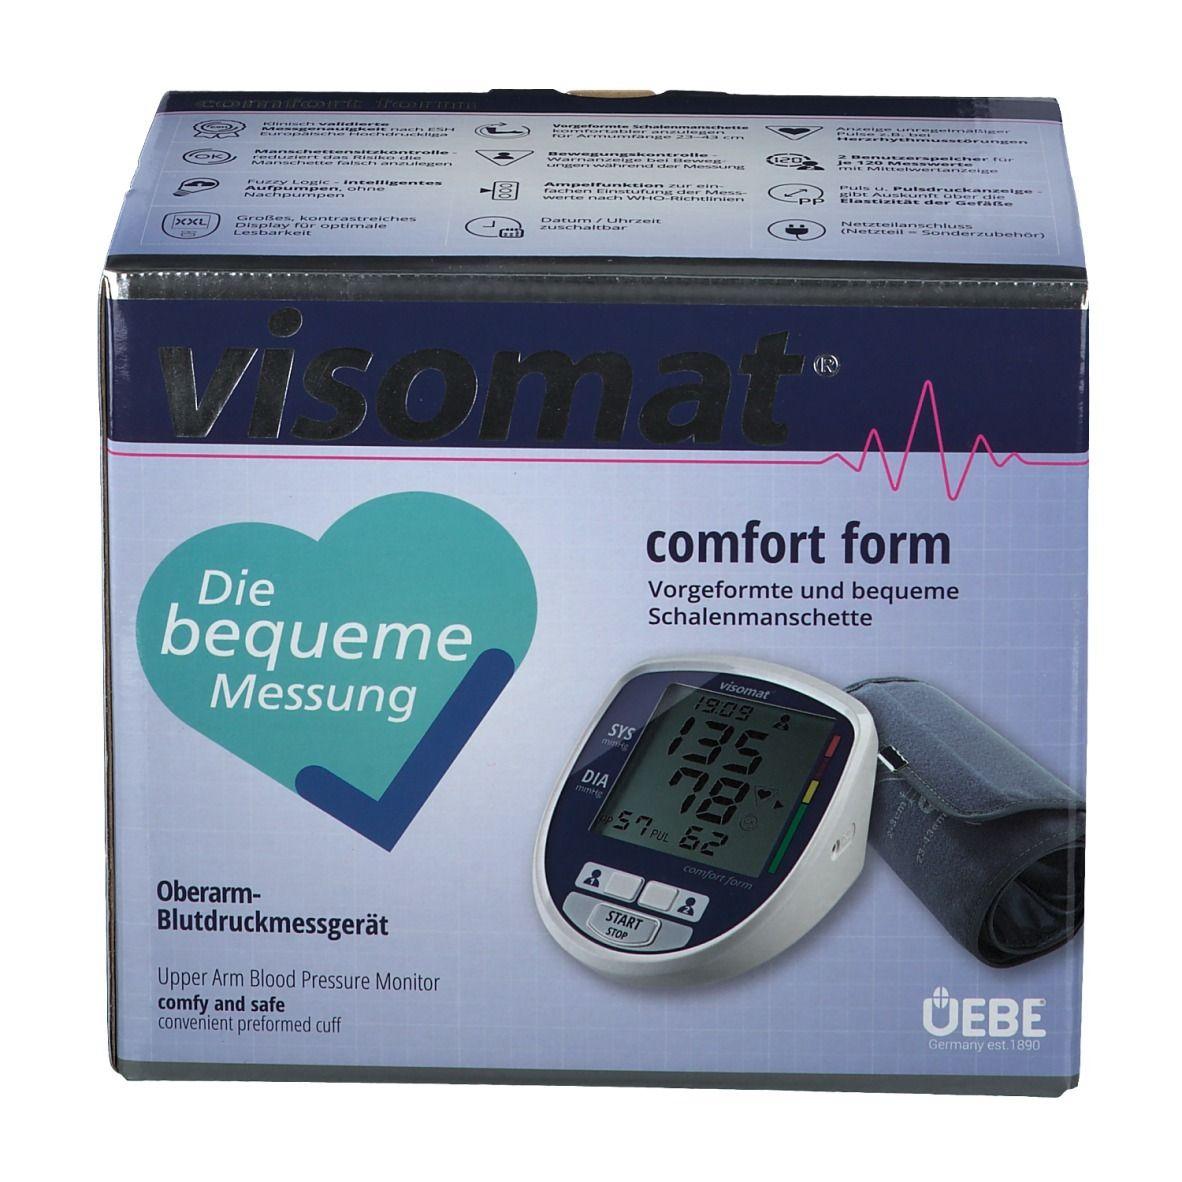 visomat® comfort form Oberarm Blutdruckmessgerät